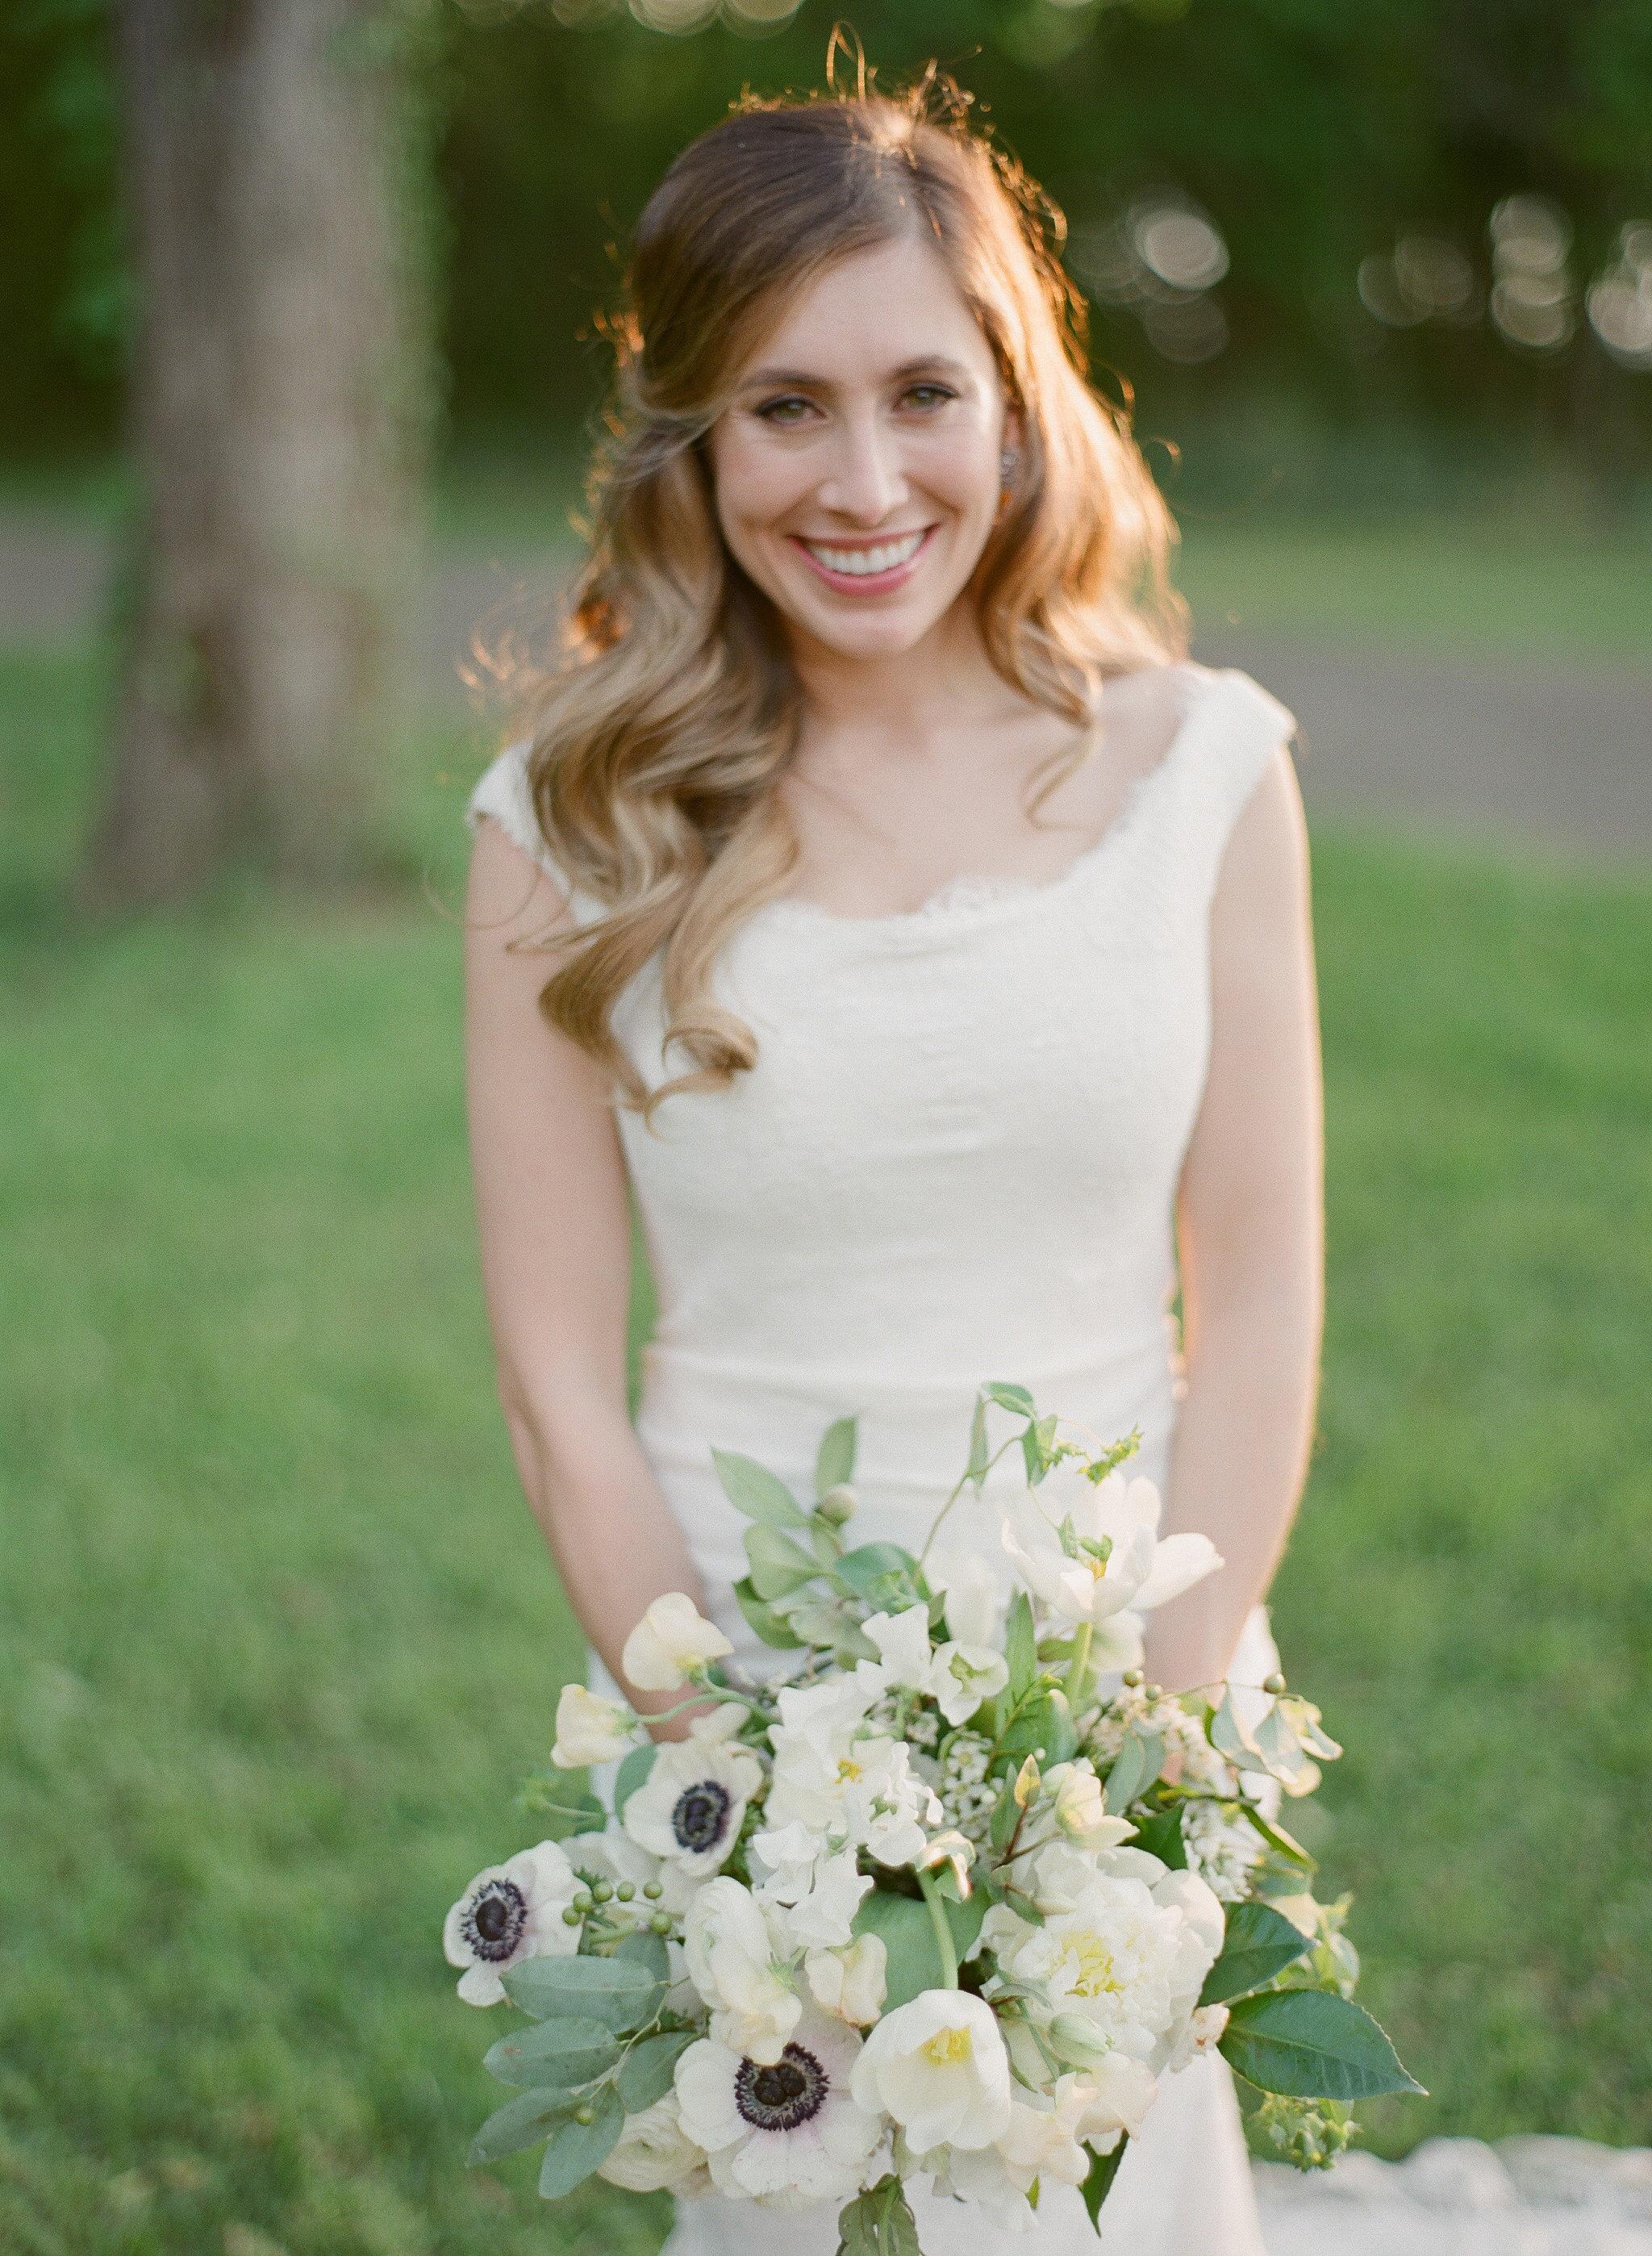 LAGUNA-GLORIA-WEDDING-AUSTIN-MATTHEW-MOORE-PHOTOGRAPHY-00383 copy.jpg